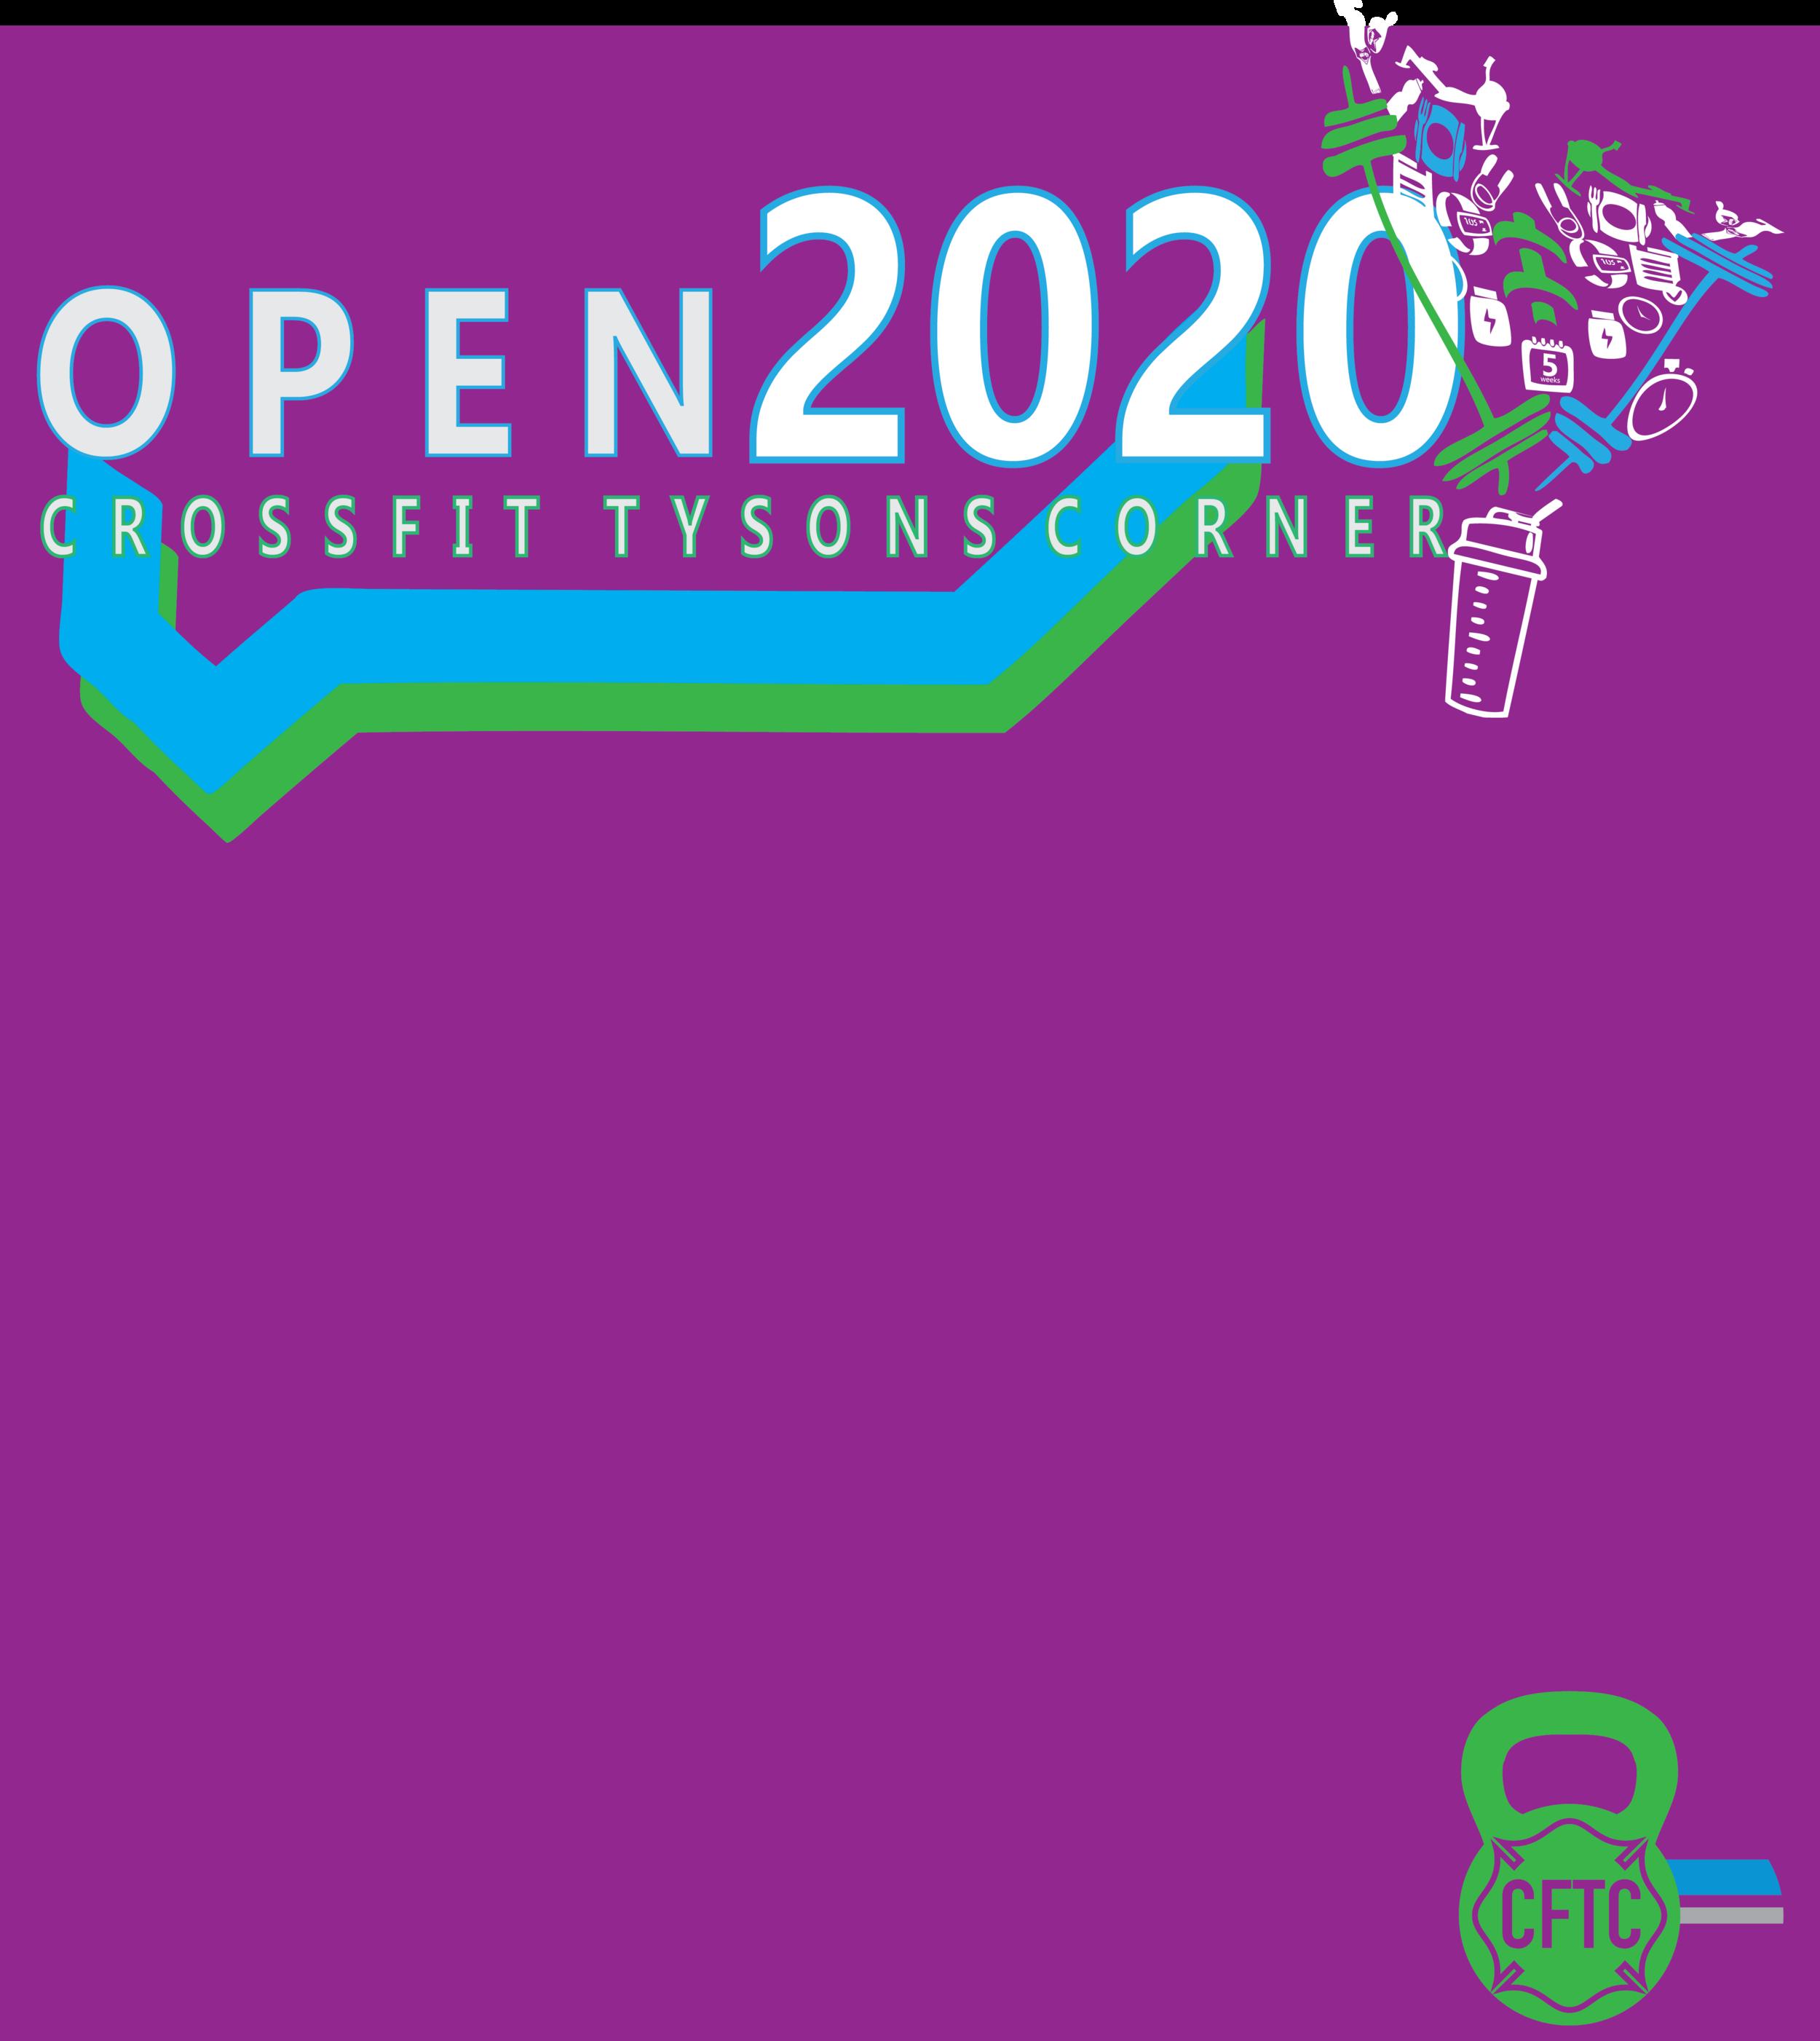 CrossFit Open 2020 - version 3 - purple background.png